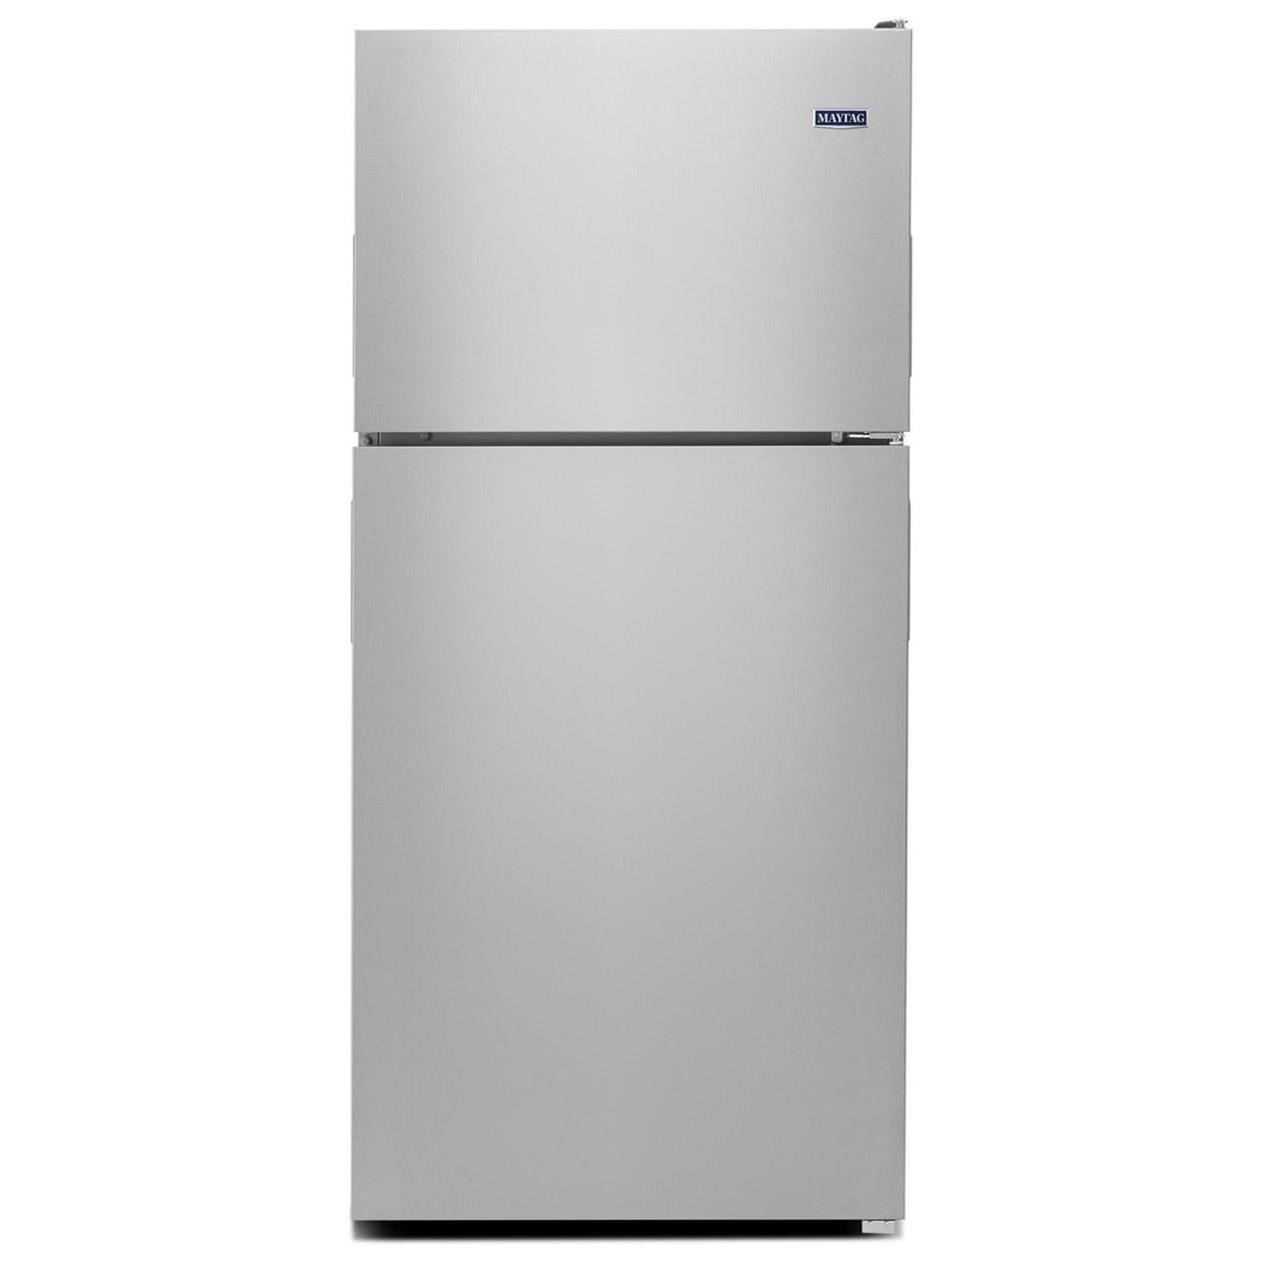 Maytag Top-Freezer Refrigerators 33-Inch Wide Top Freezer Refrigerator - Item Number: MRT311FFFZ